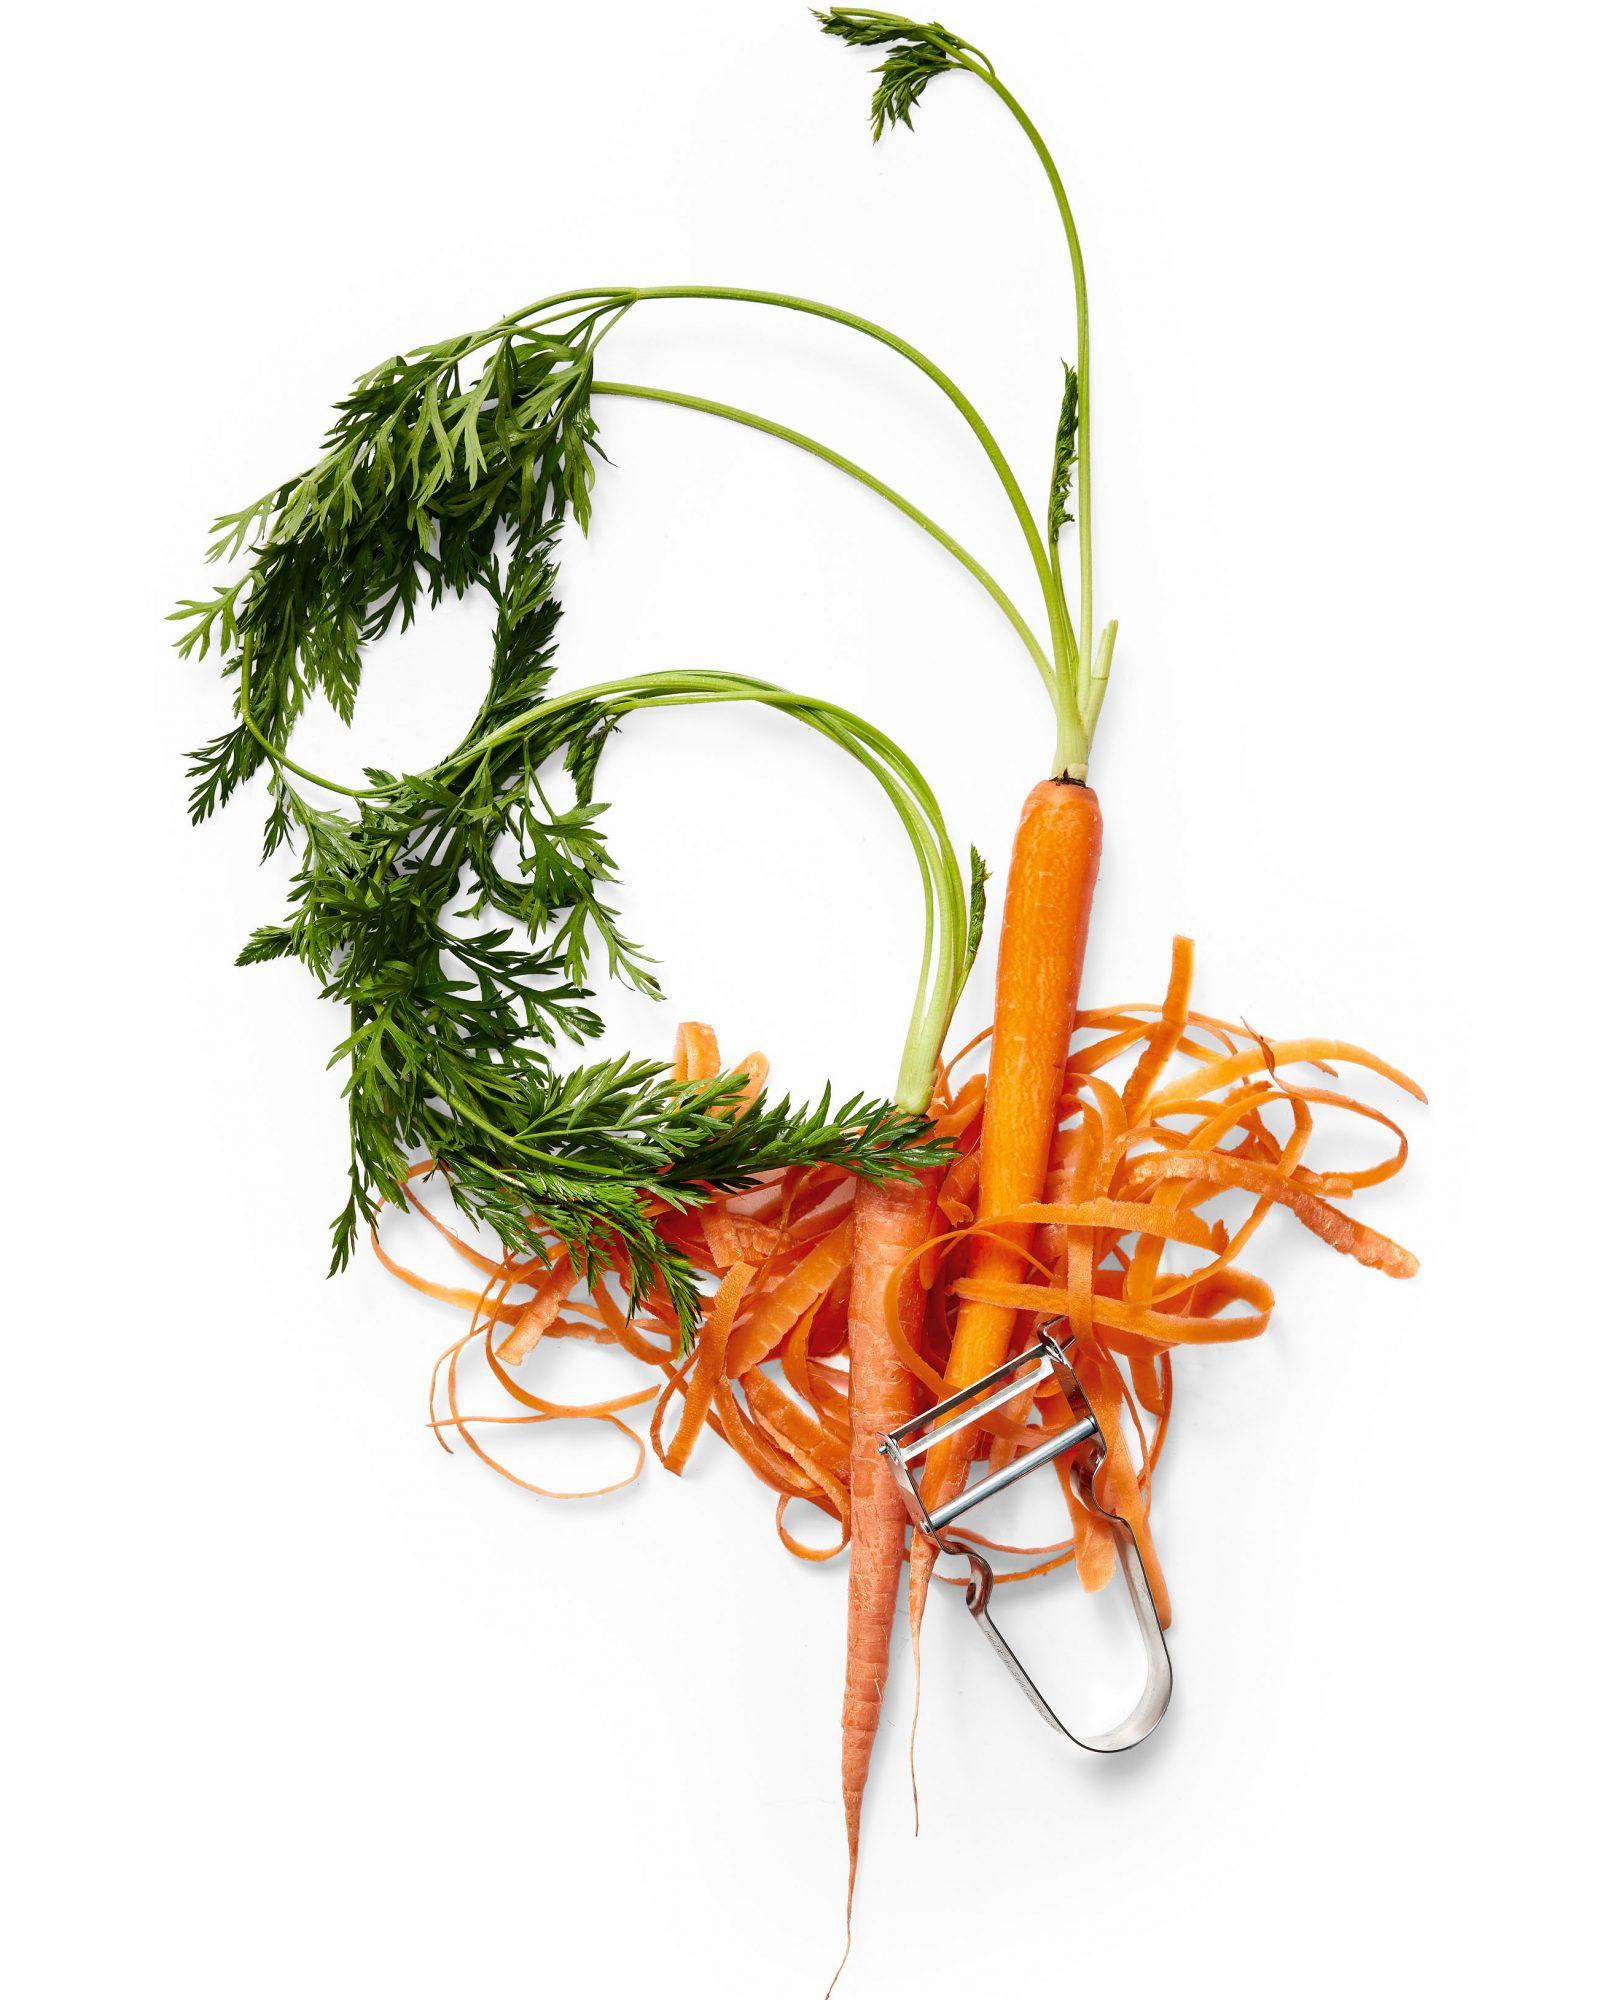 peeled carrot